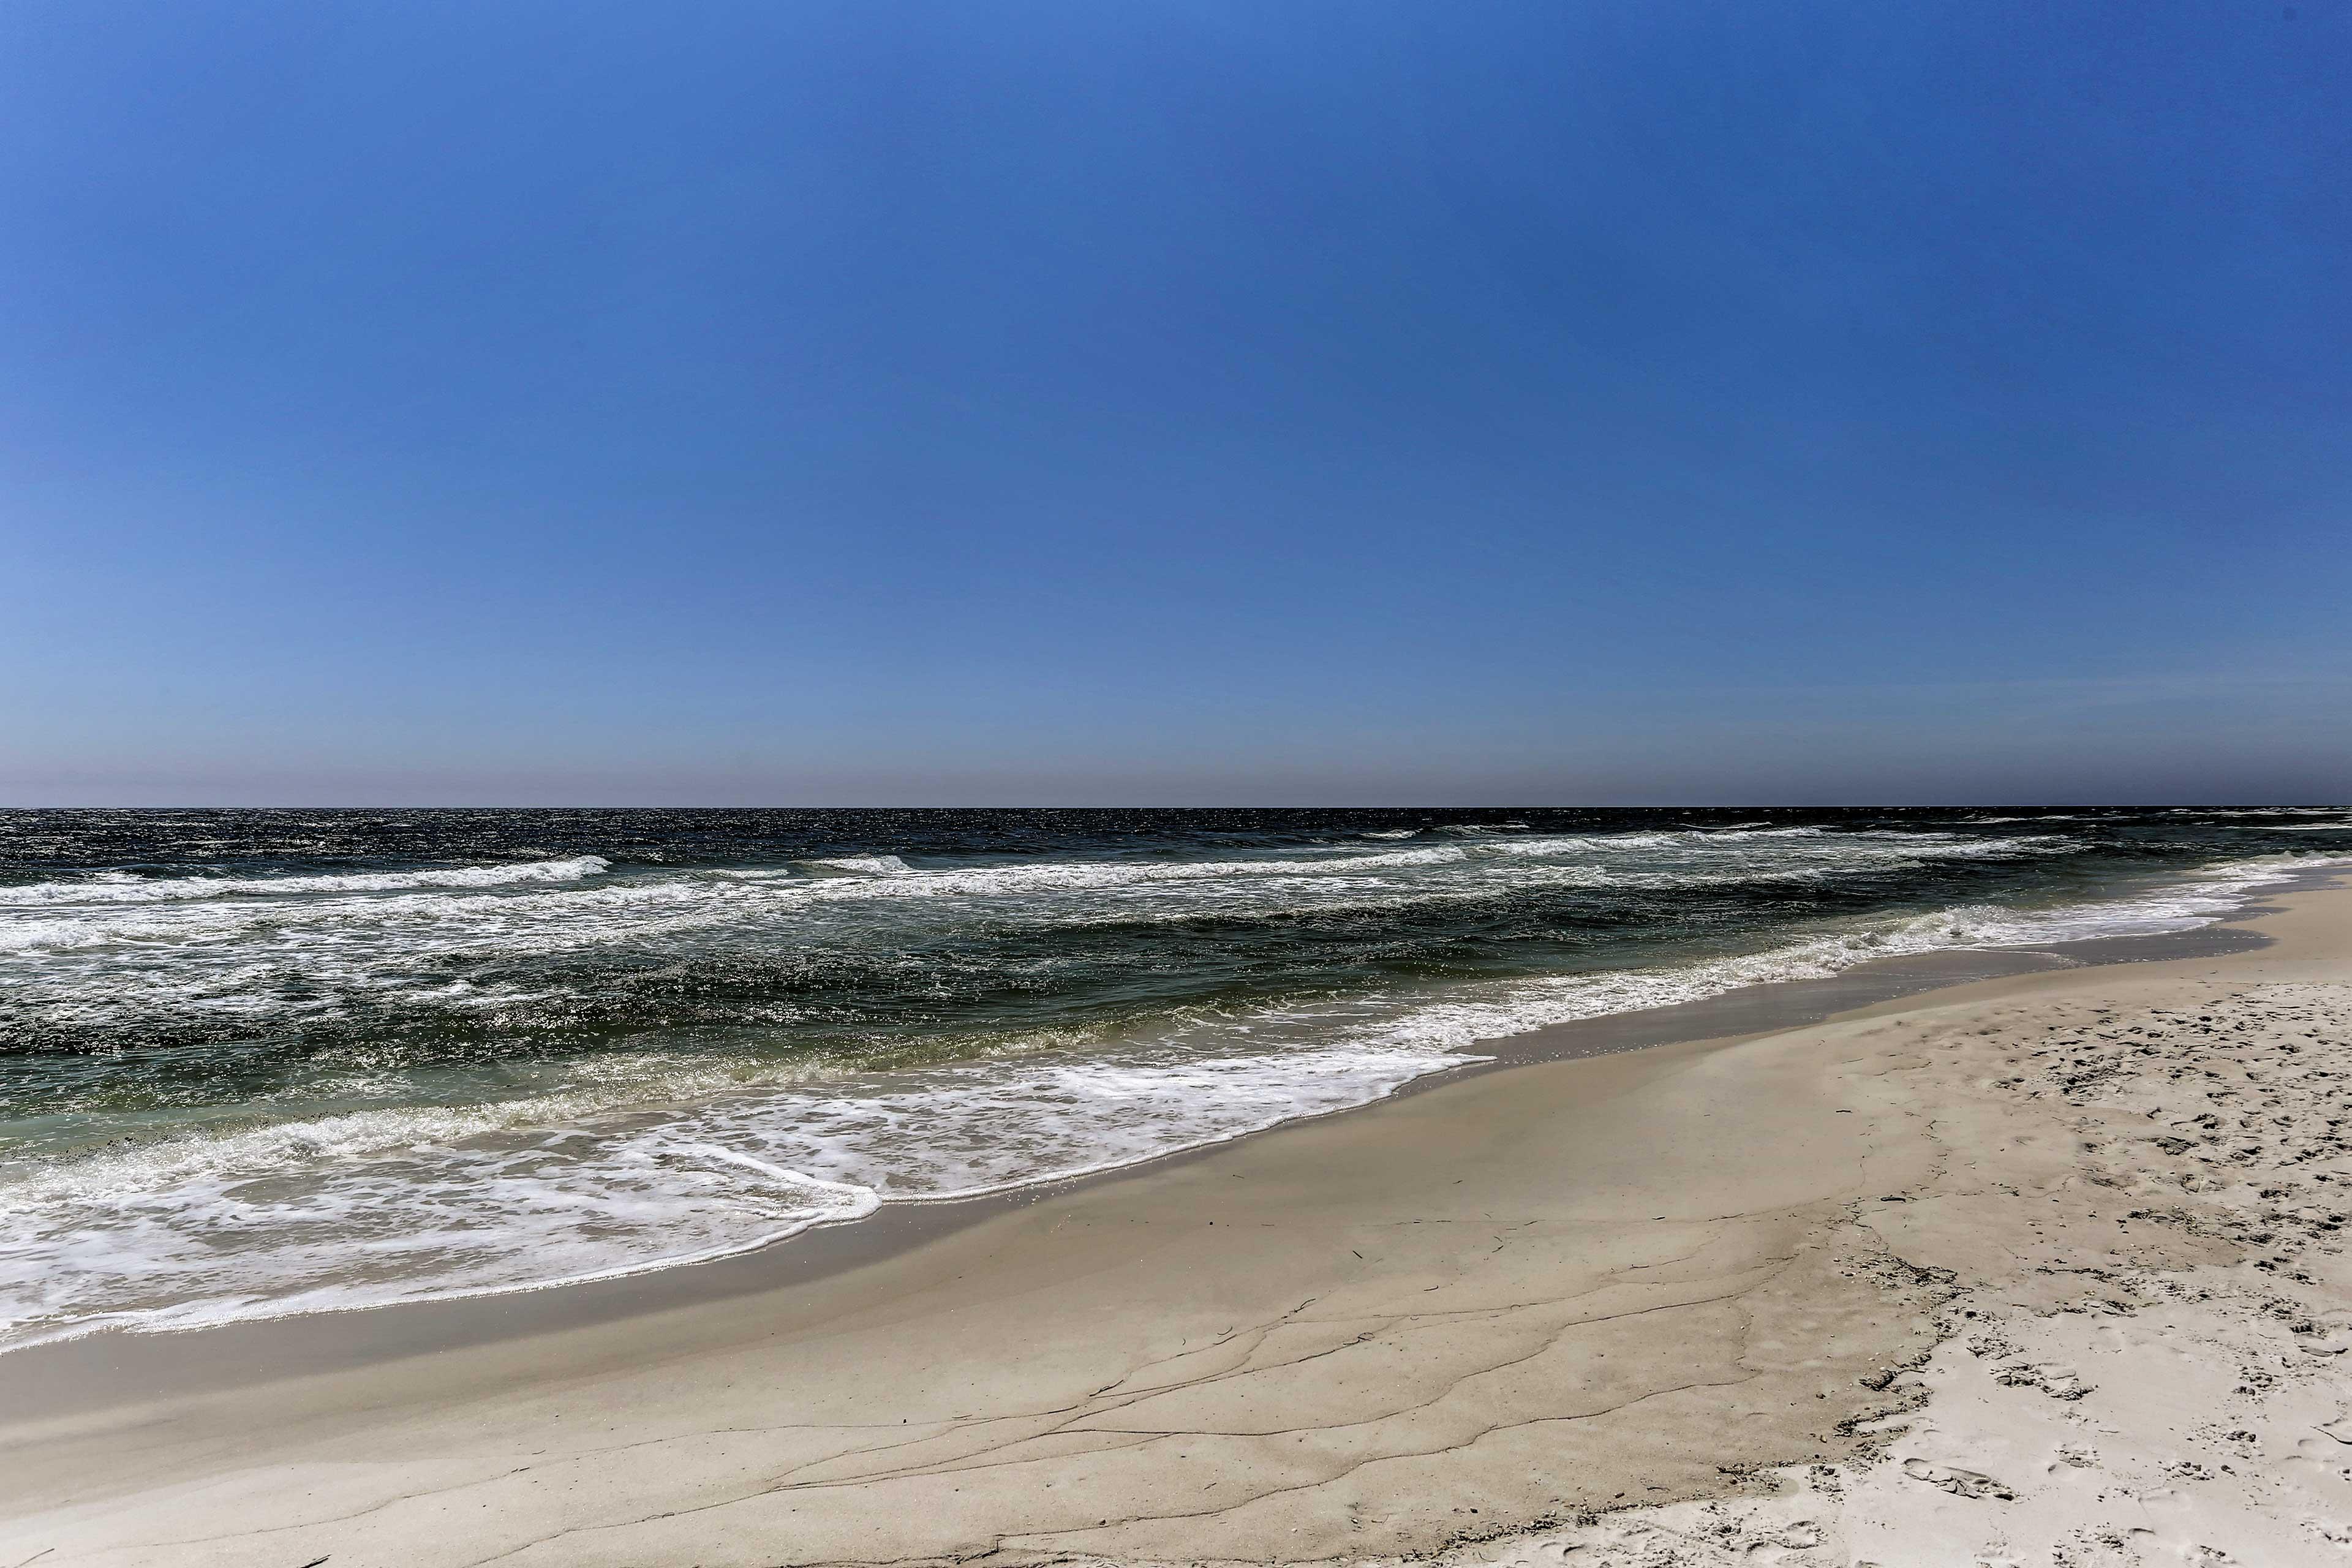 Look forward to idyllic seaside afternoons.